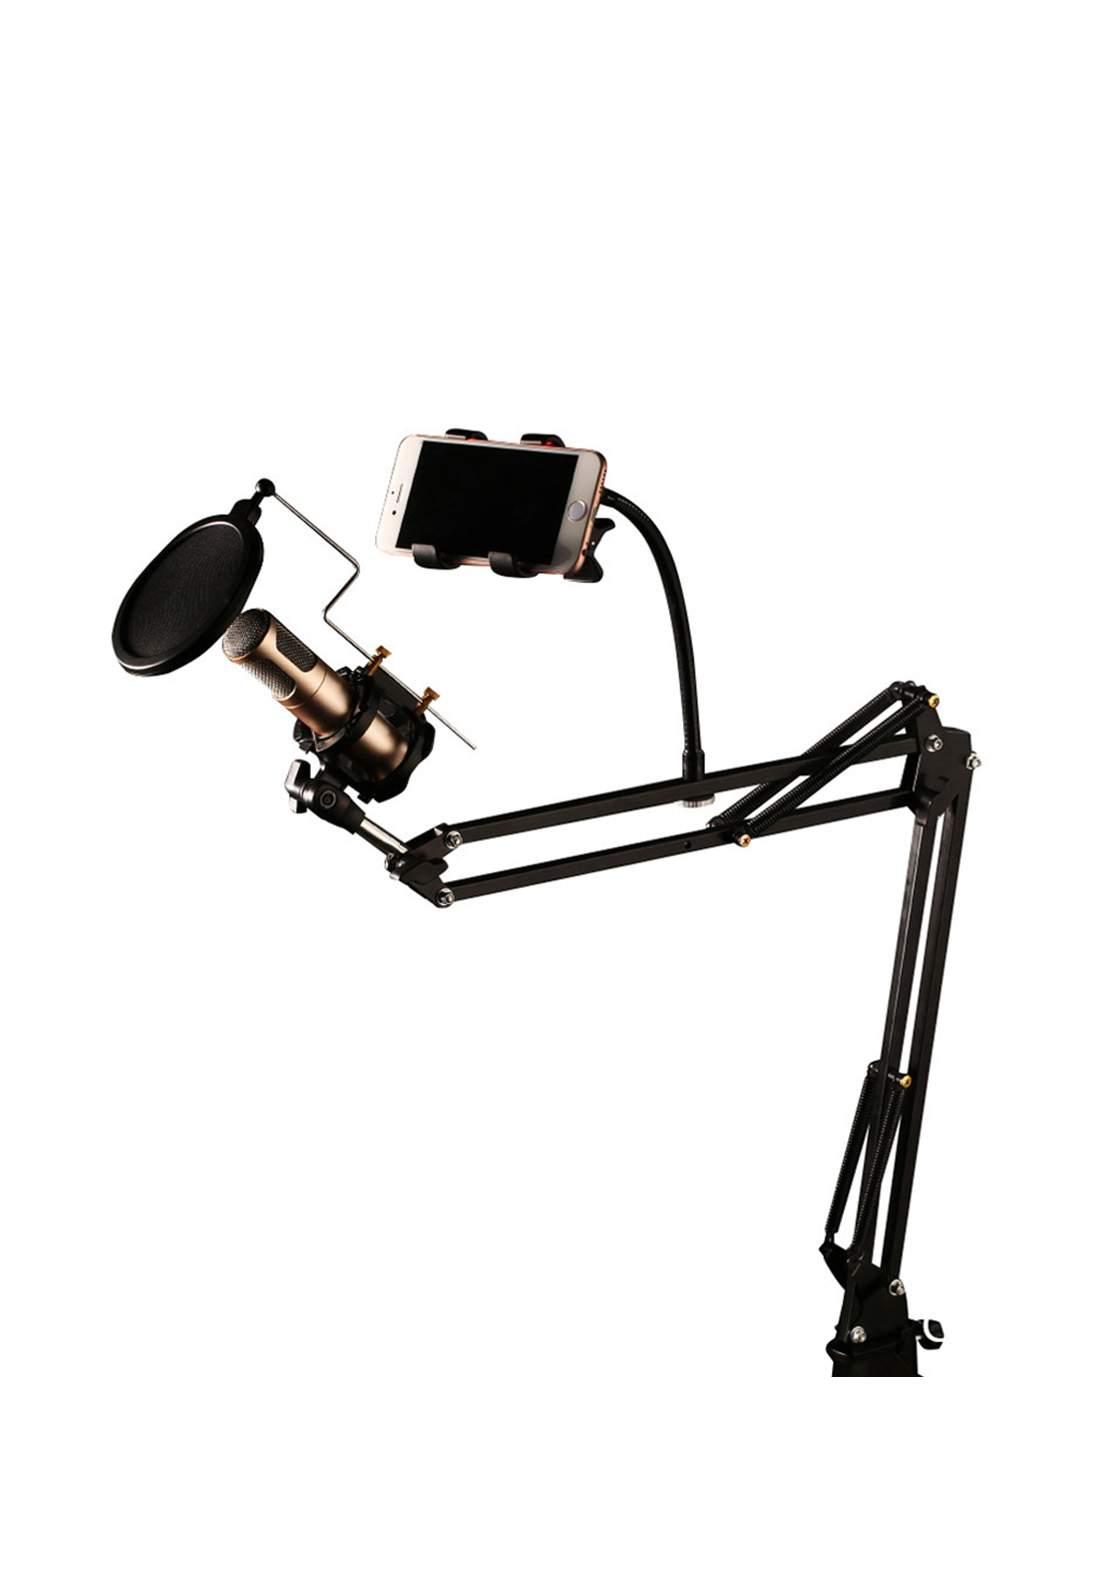 Remax CK100 Mobile Recording Studio Set Microphone Stand - Black مايكروفون